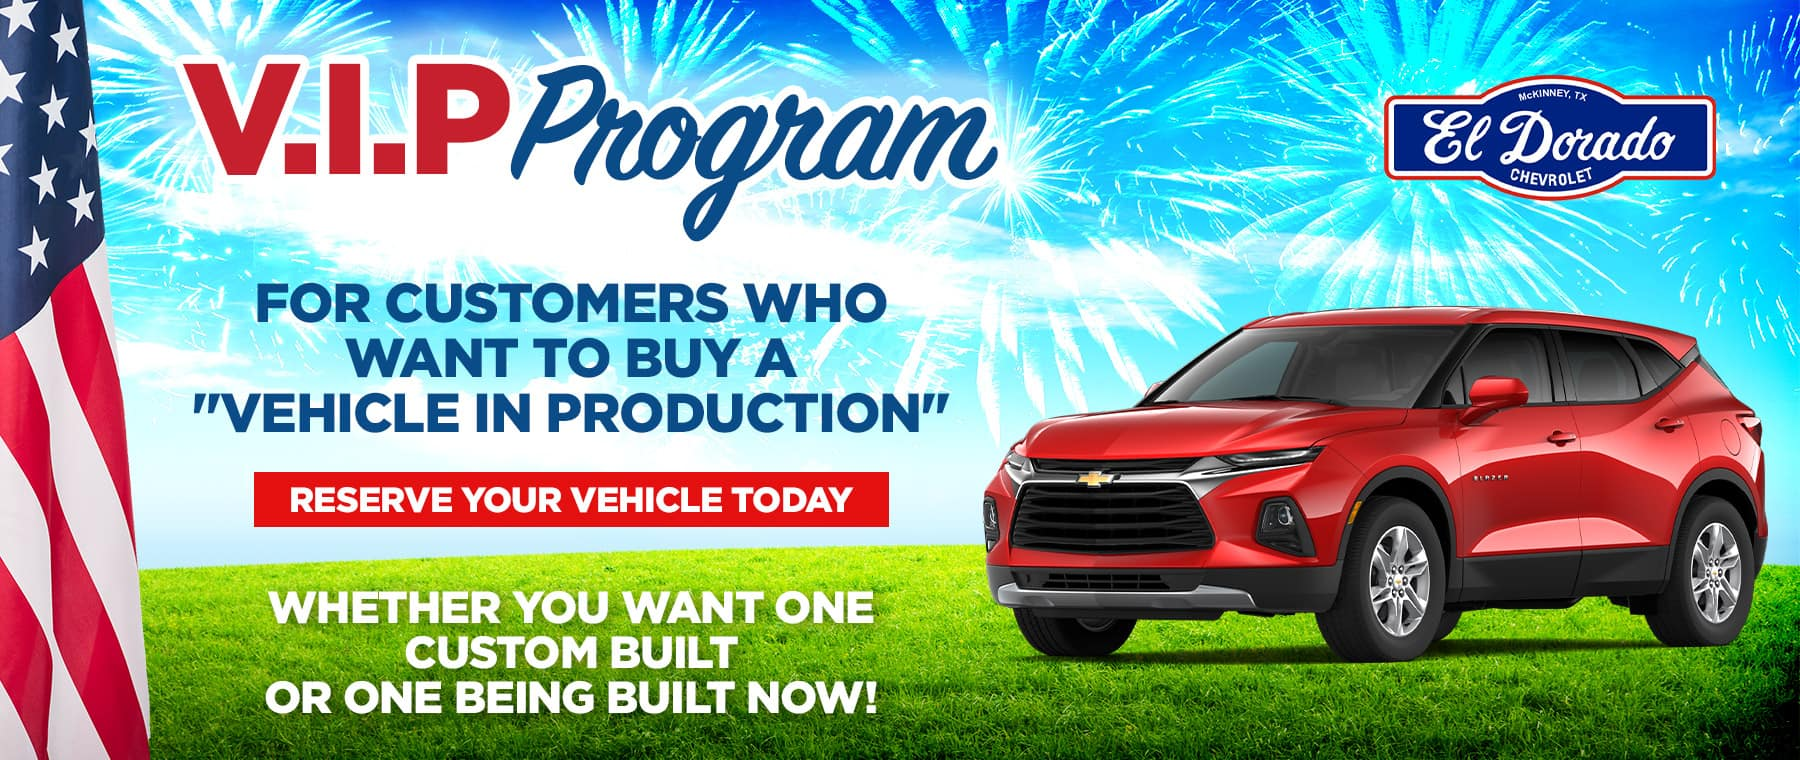 V.I.P. Program - El Dorado Chevrolet in McKinney, Texas